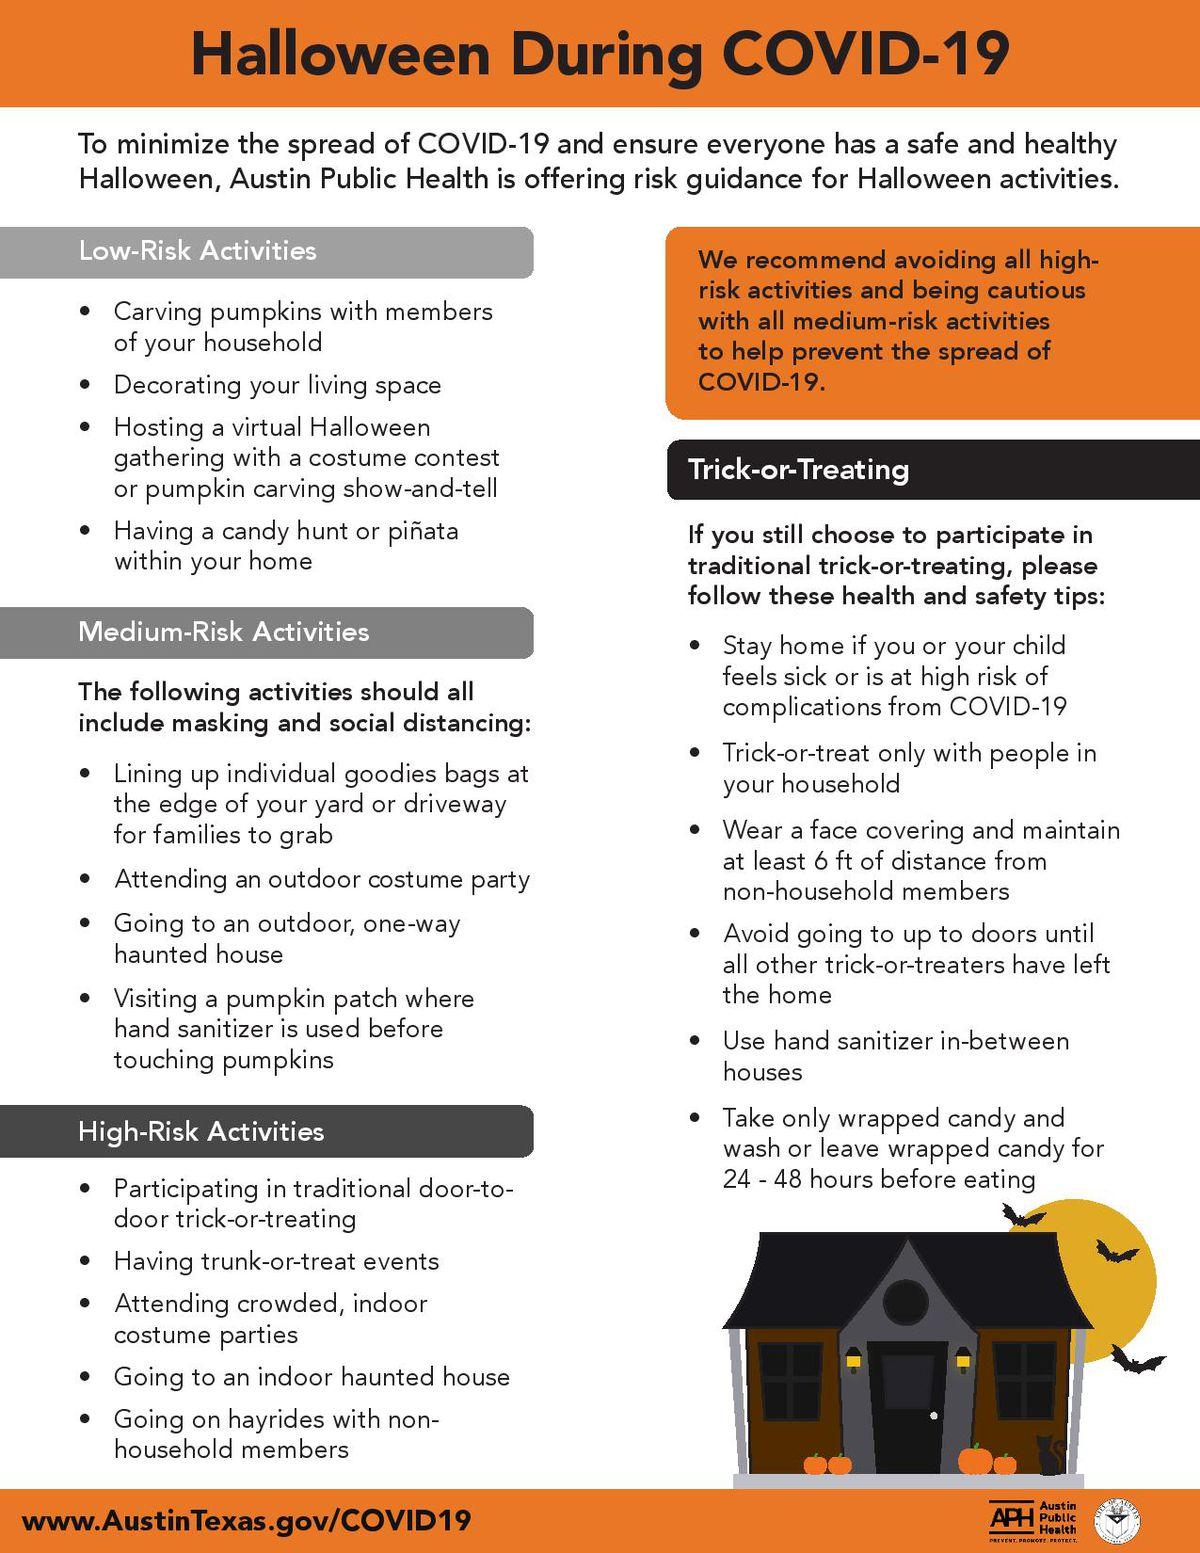 Austin Public Health's Halloween recommendations during the novel coronavirus pandemic